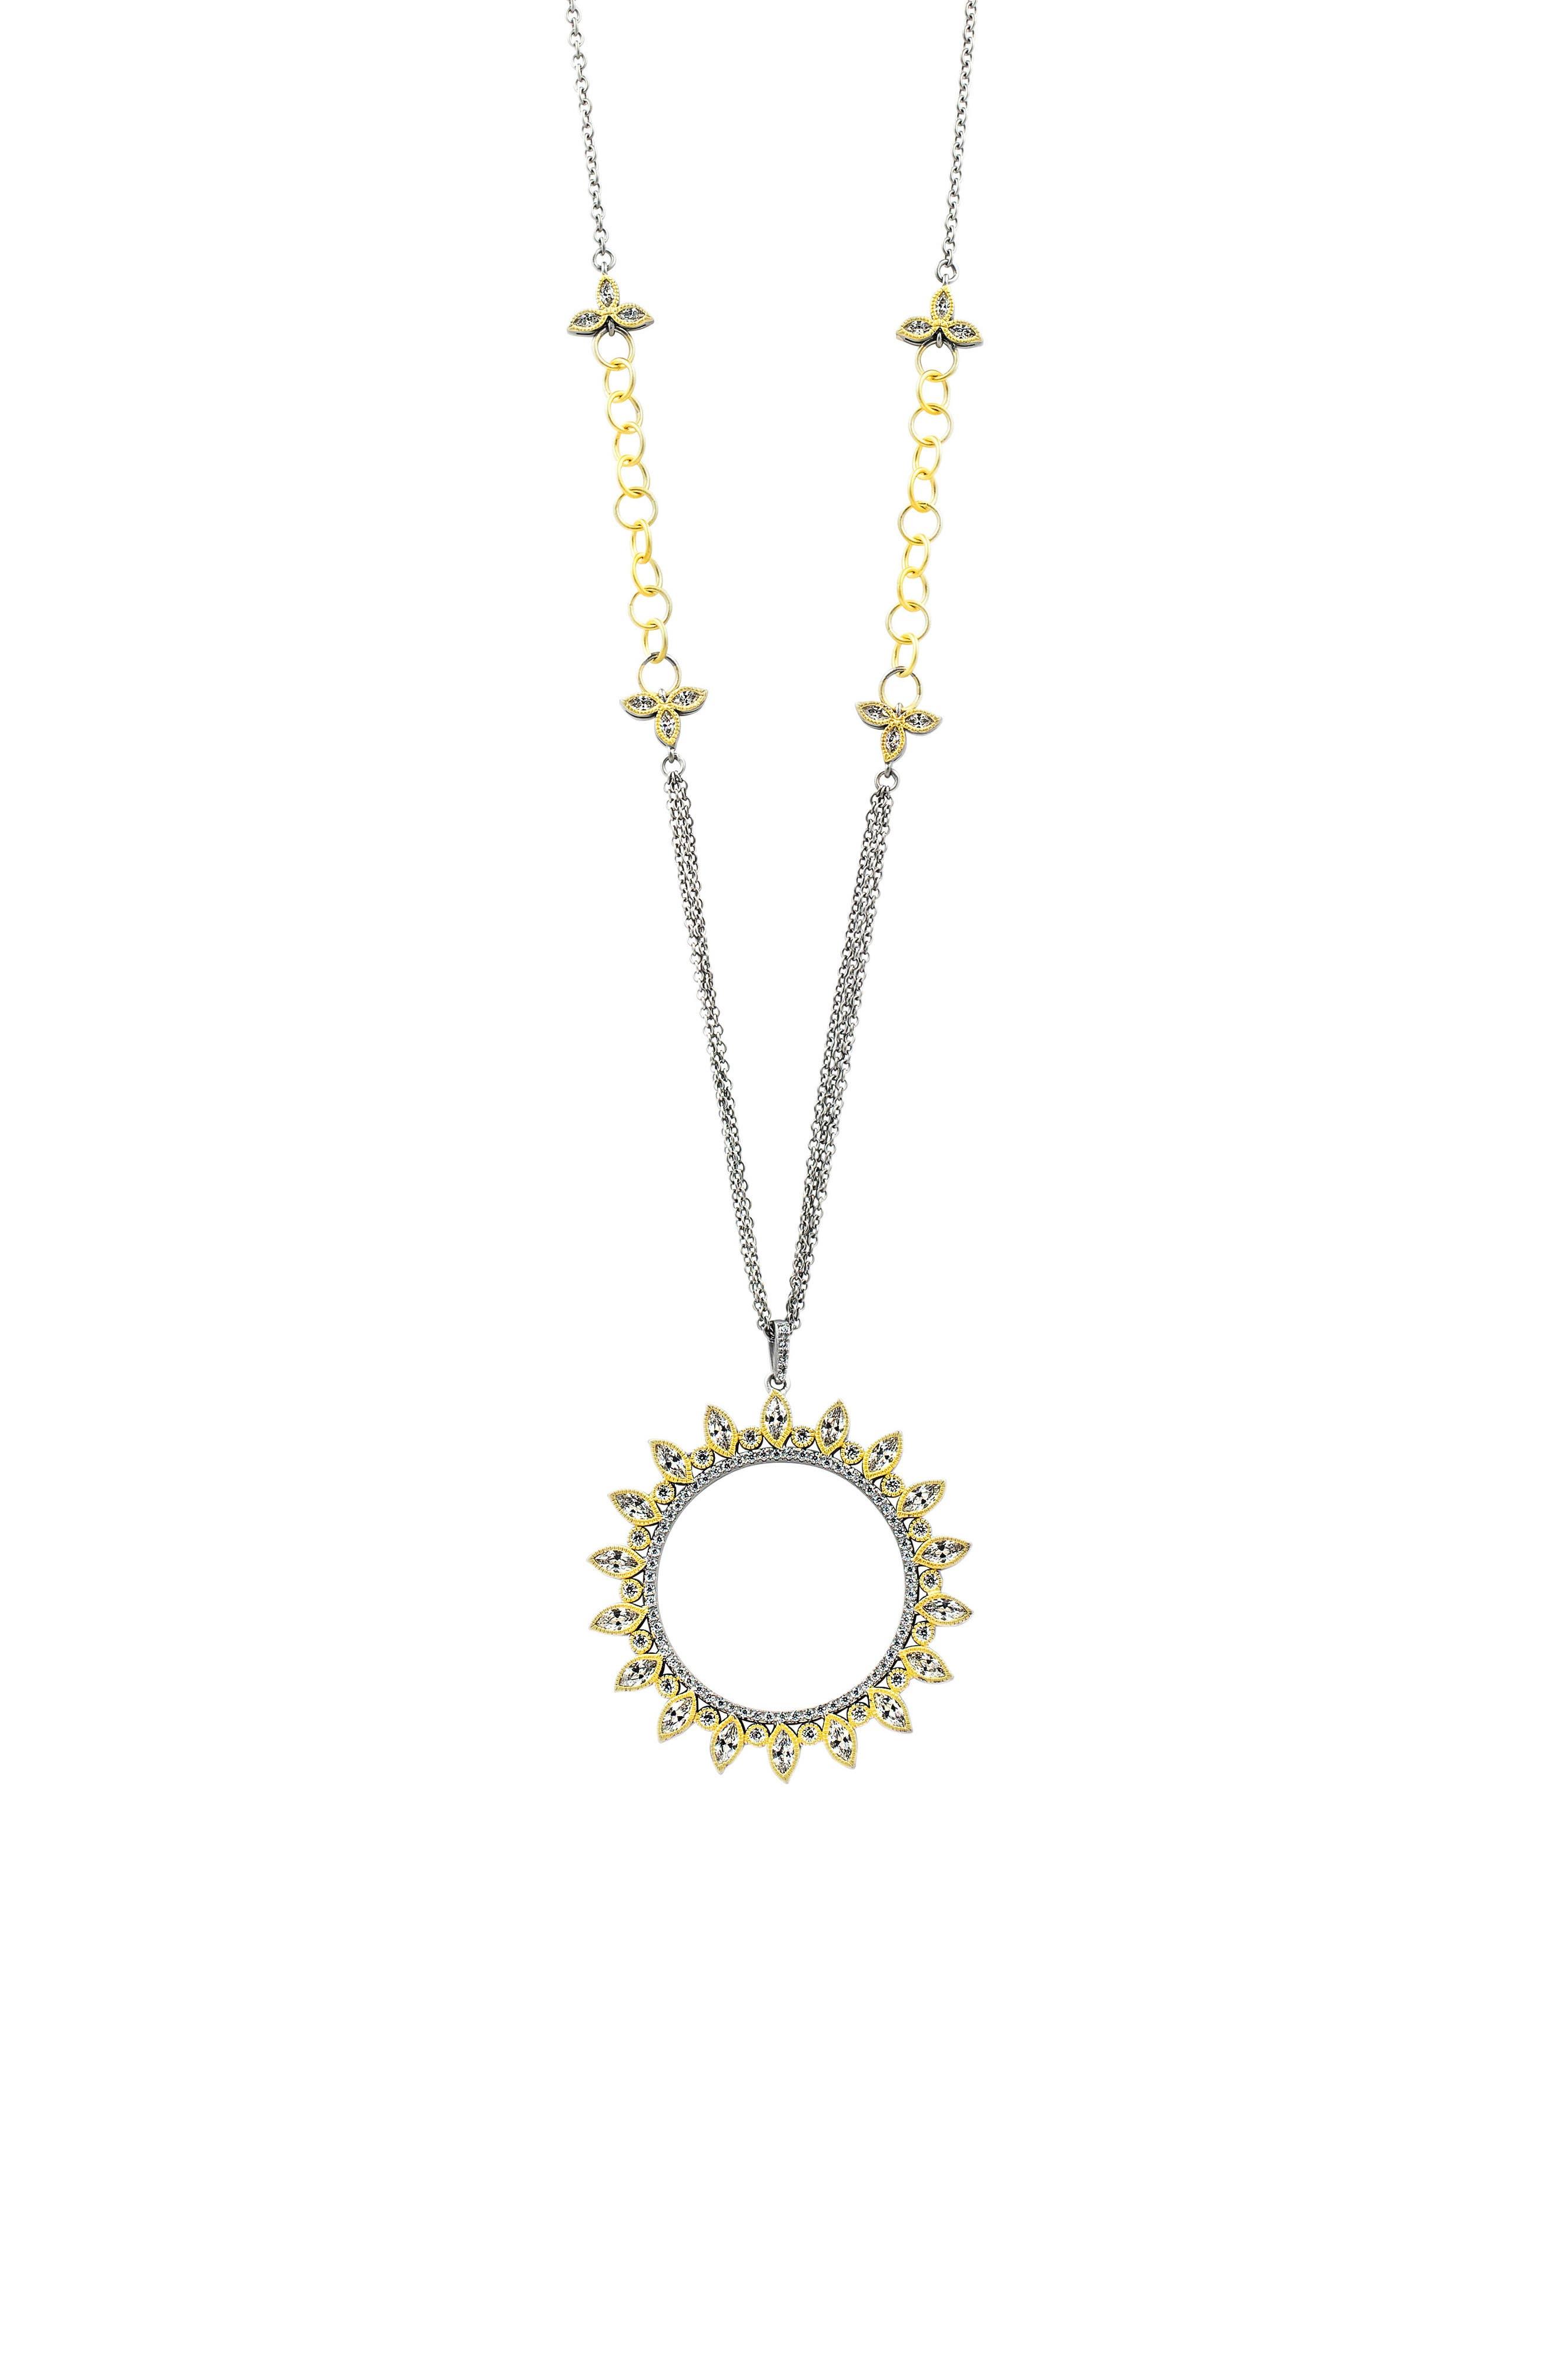 Main Image - FREIDA ROTHMAN Fleur Bloom Openwork Pendant Necklace